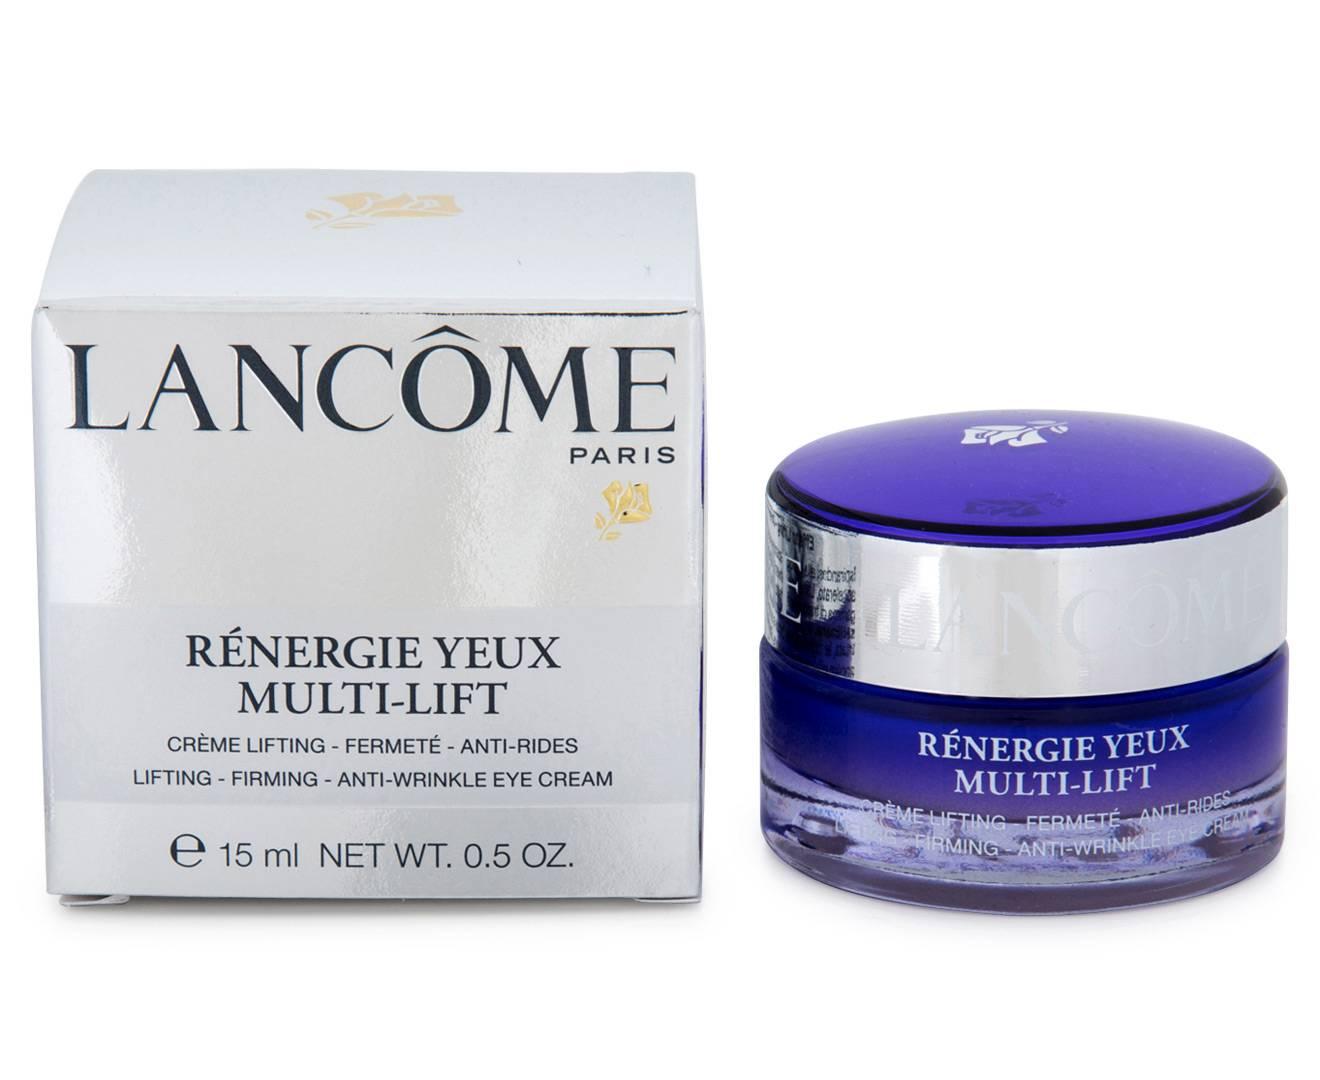 Lancome renergie multi lift (ланком мульти лифт) – крем для лица и кожи вокруг глаз, косметика активатор молодости